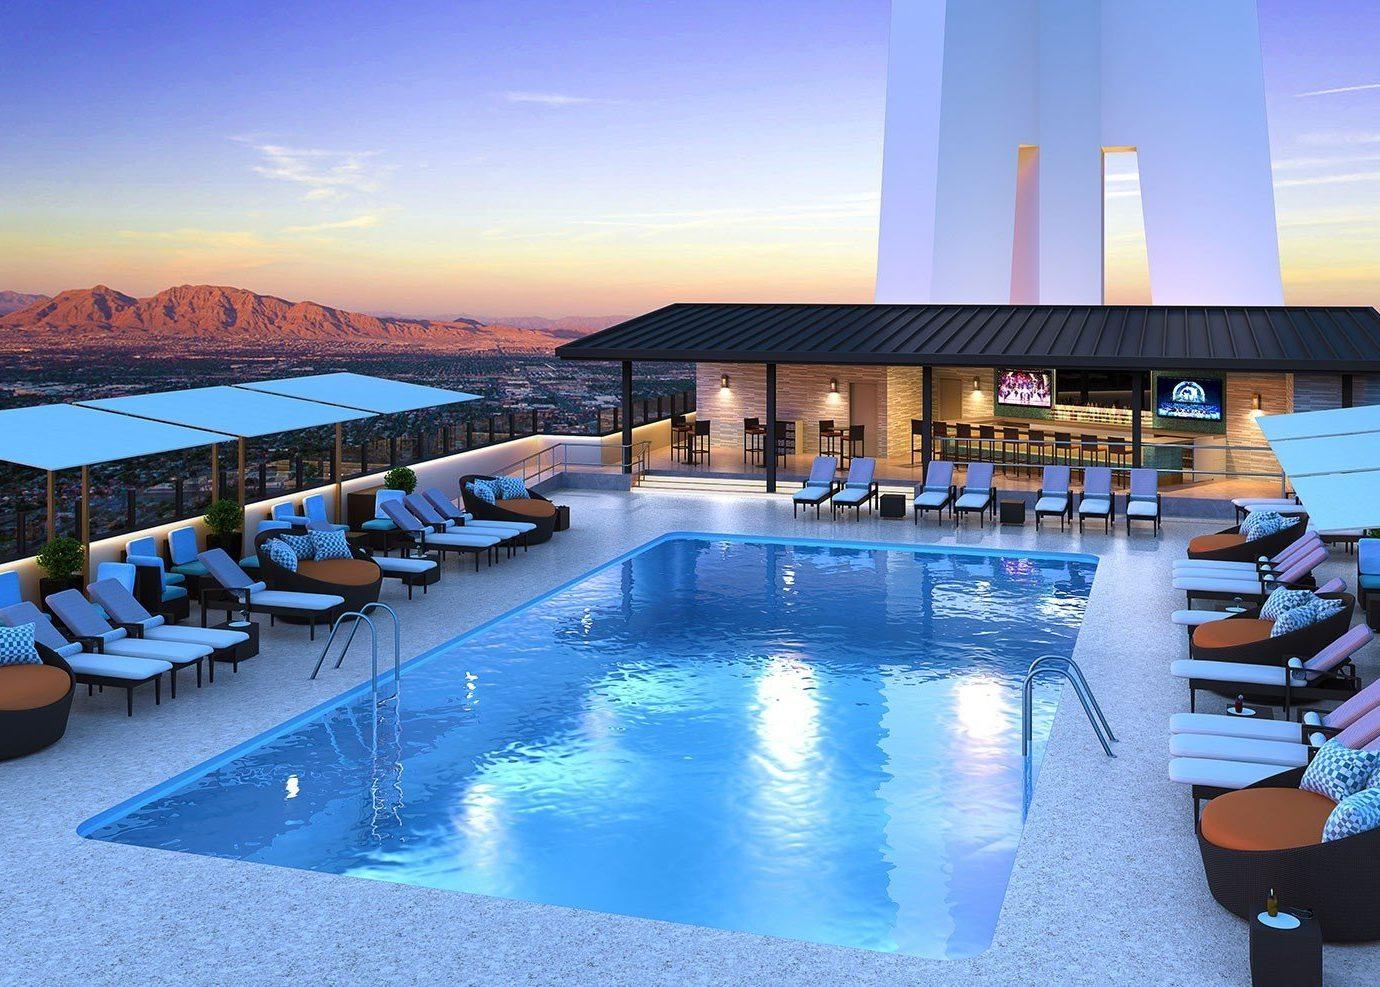 Trip Ideas sky water Boat leisure swimming pool outdoor scene vacation Resort Pool estate Lake Harbor swimming